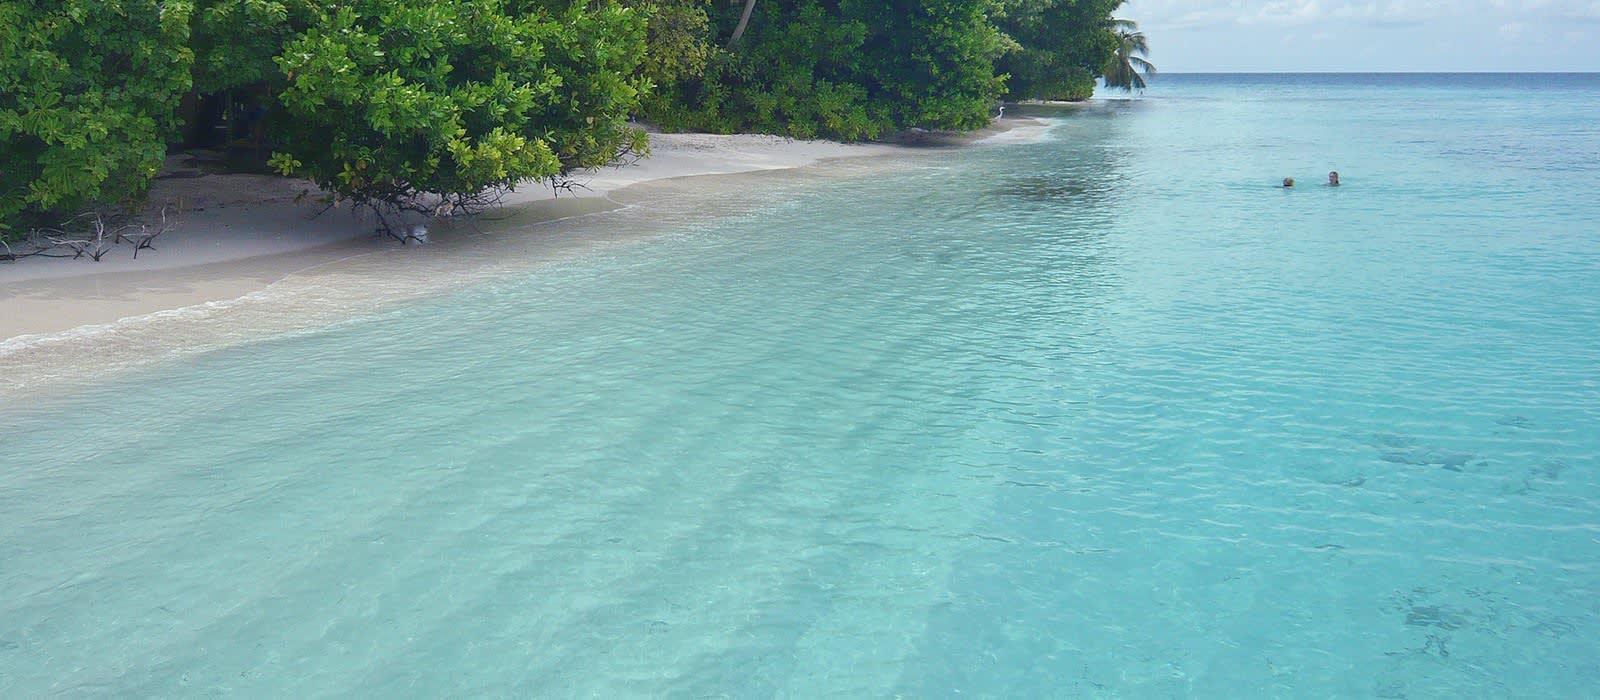 Strand auf Malediven